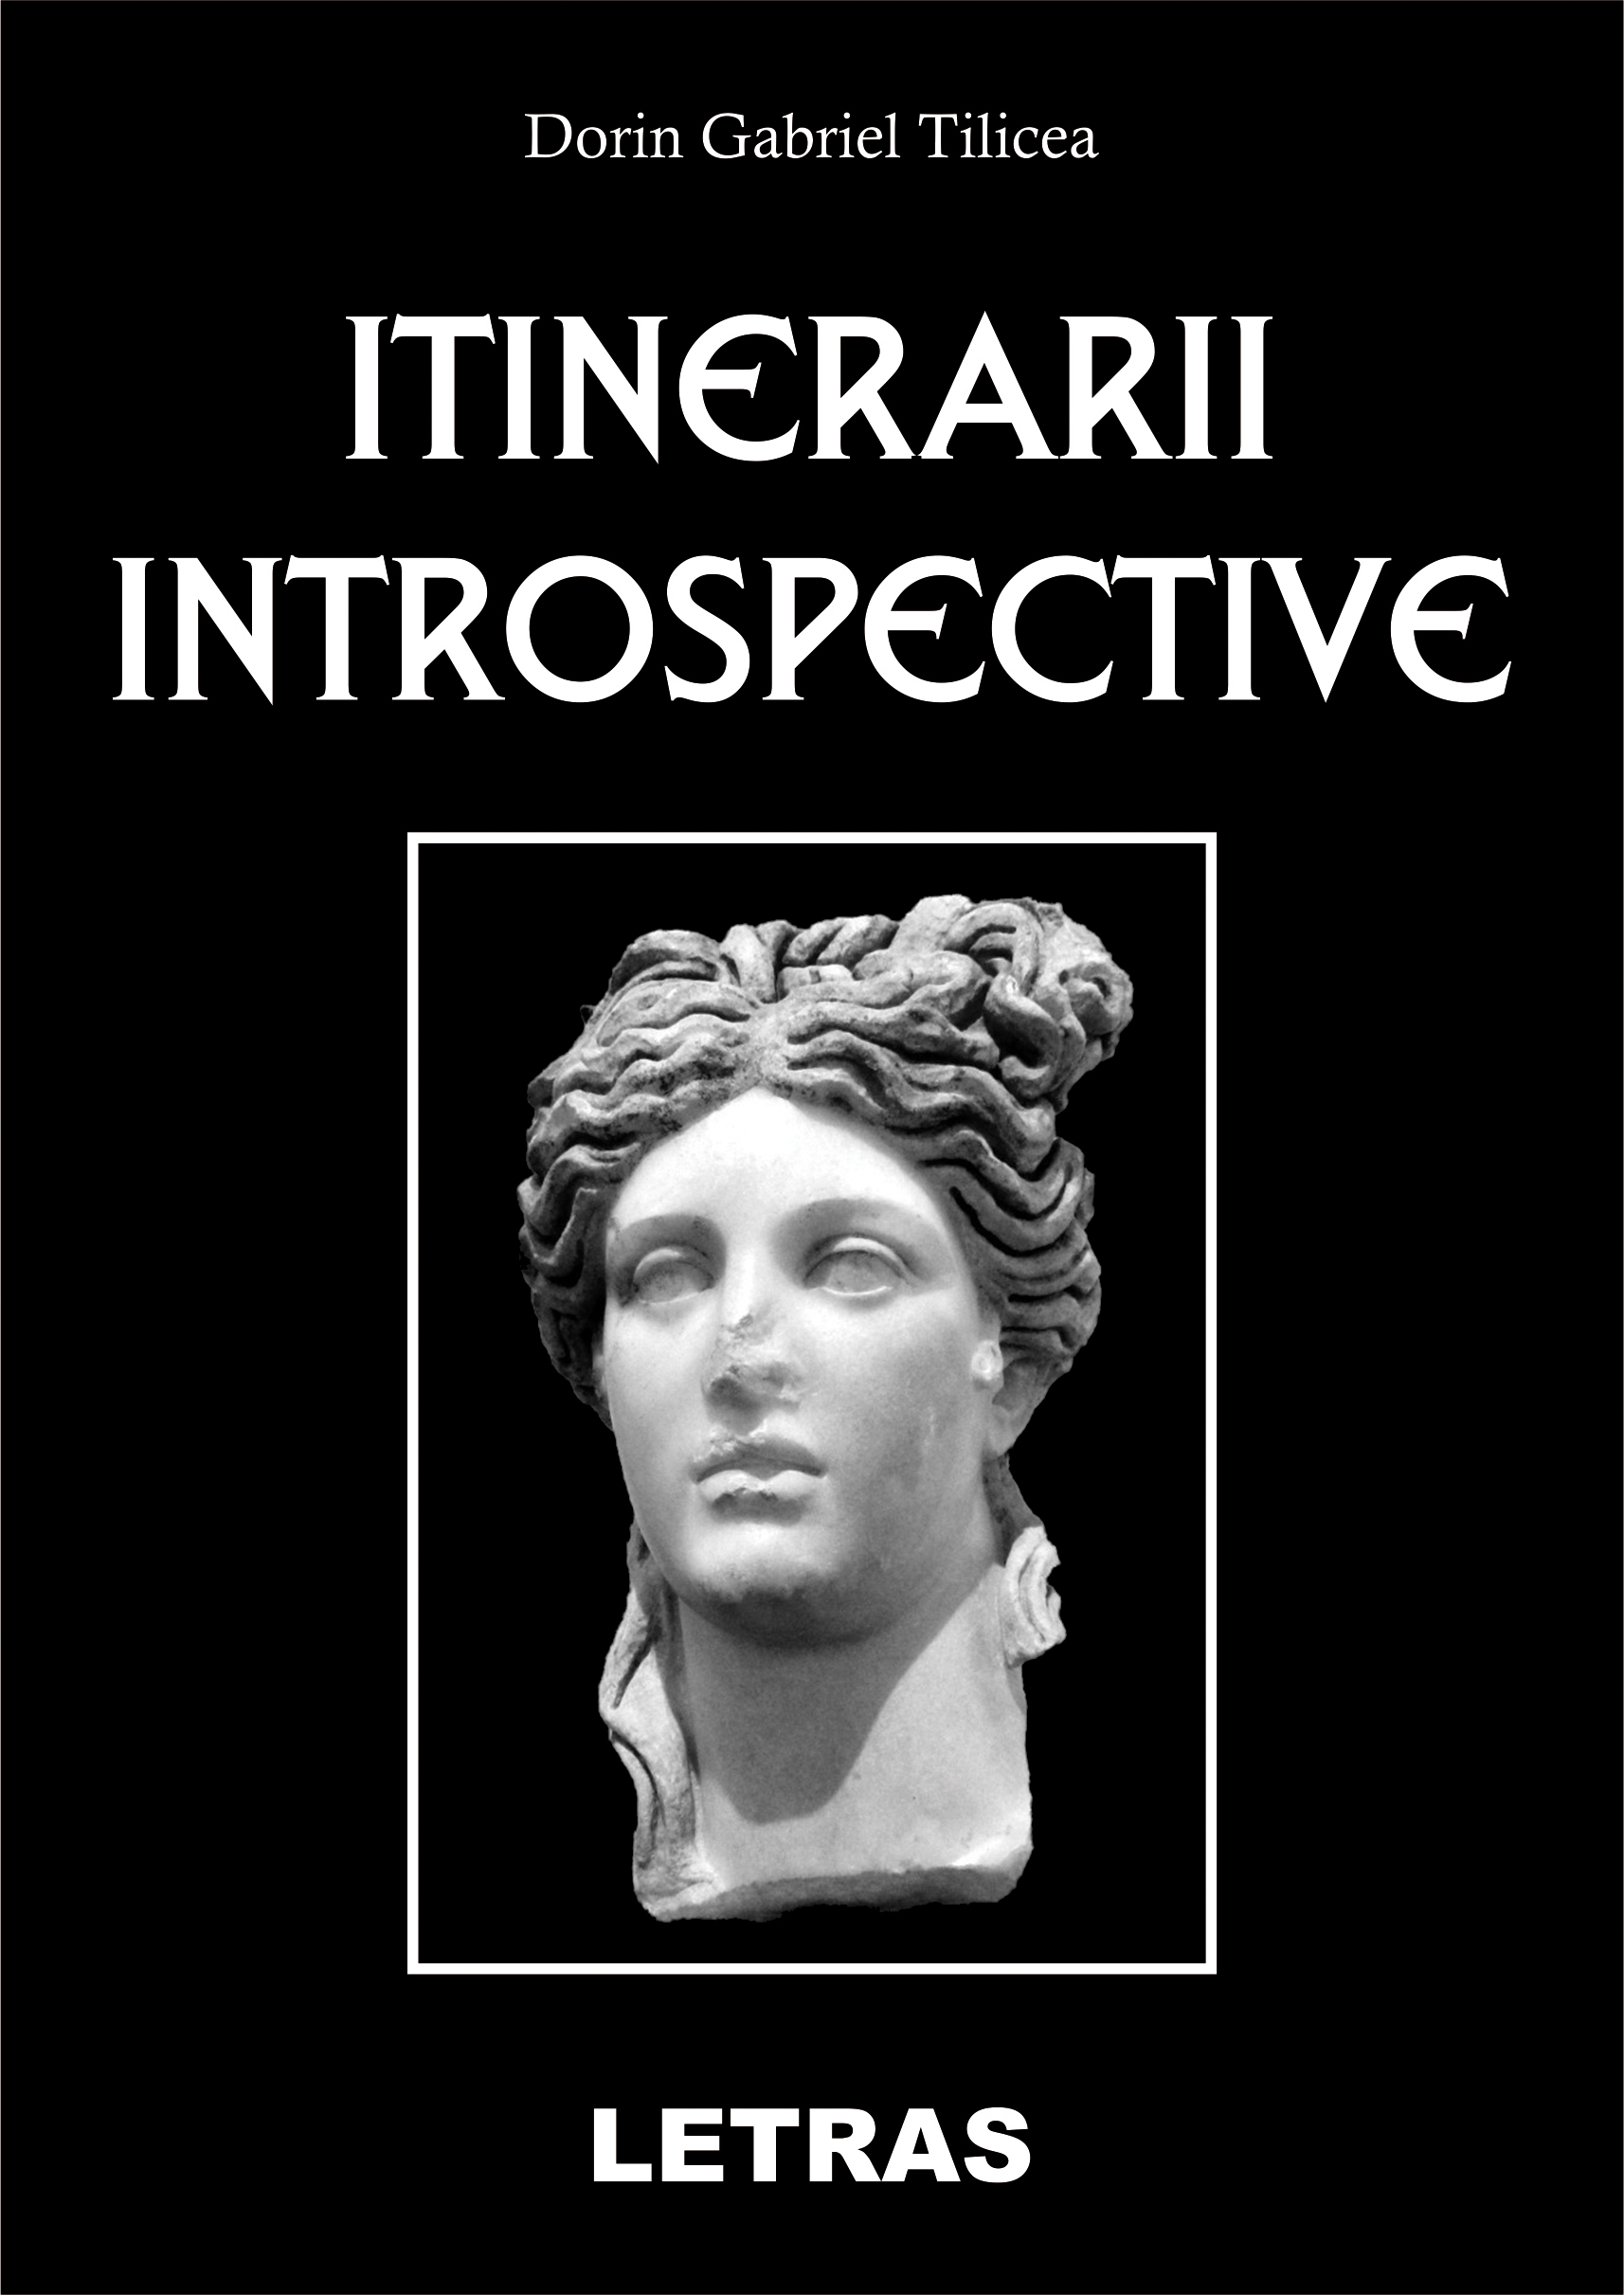 Tilicea Dorin_Itinerarii introspective_coperta 1_300 dpi_RGB